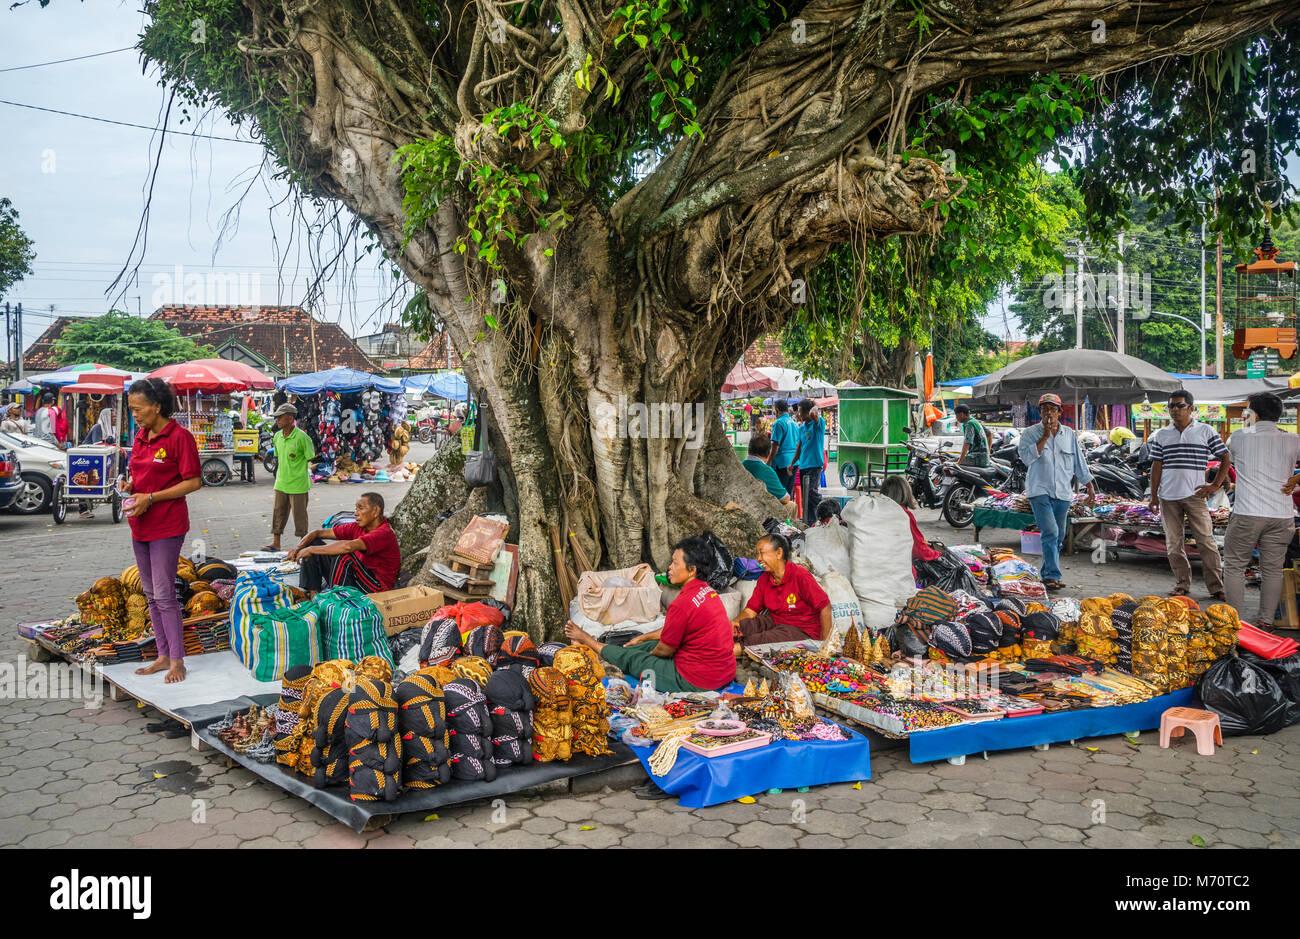 souvenir merchants under a Banyon tree at the Kraton Yogyakarta, Central Java, Indonesia - Stock Image